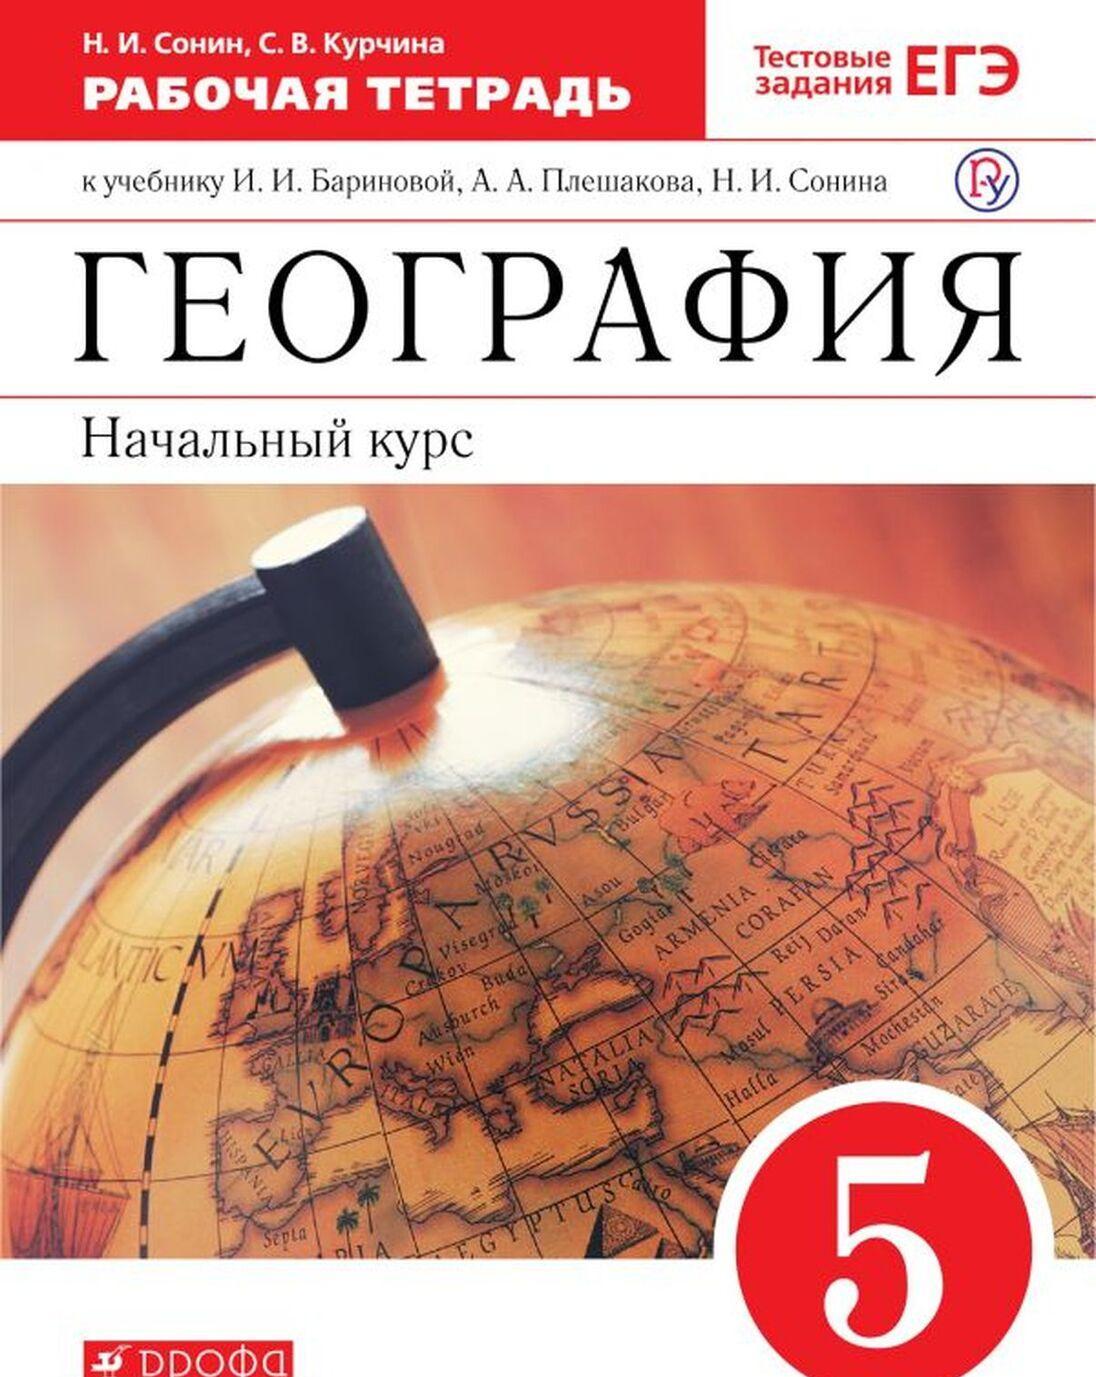 Geografija. 5 klass. Rabochaja tetrad. K uchebniku I. I. Barinovoj i dr. | Sonin Nikolaj Ivanovich, Kurchina Svetlana Valentinovna